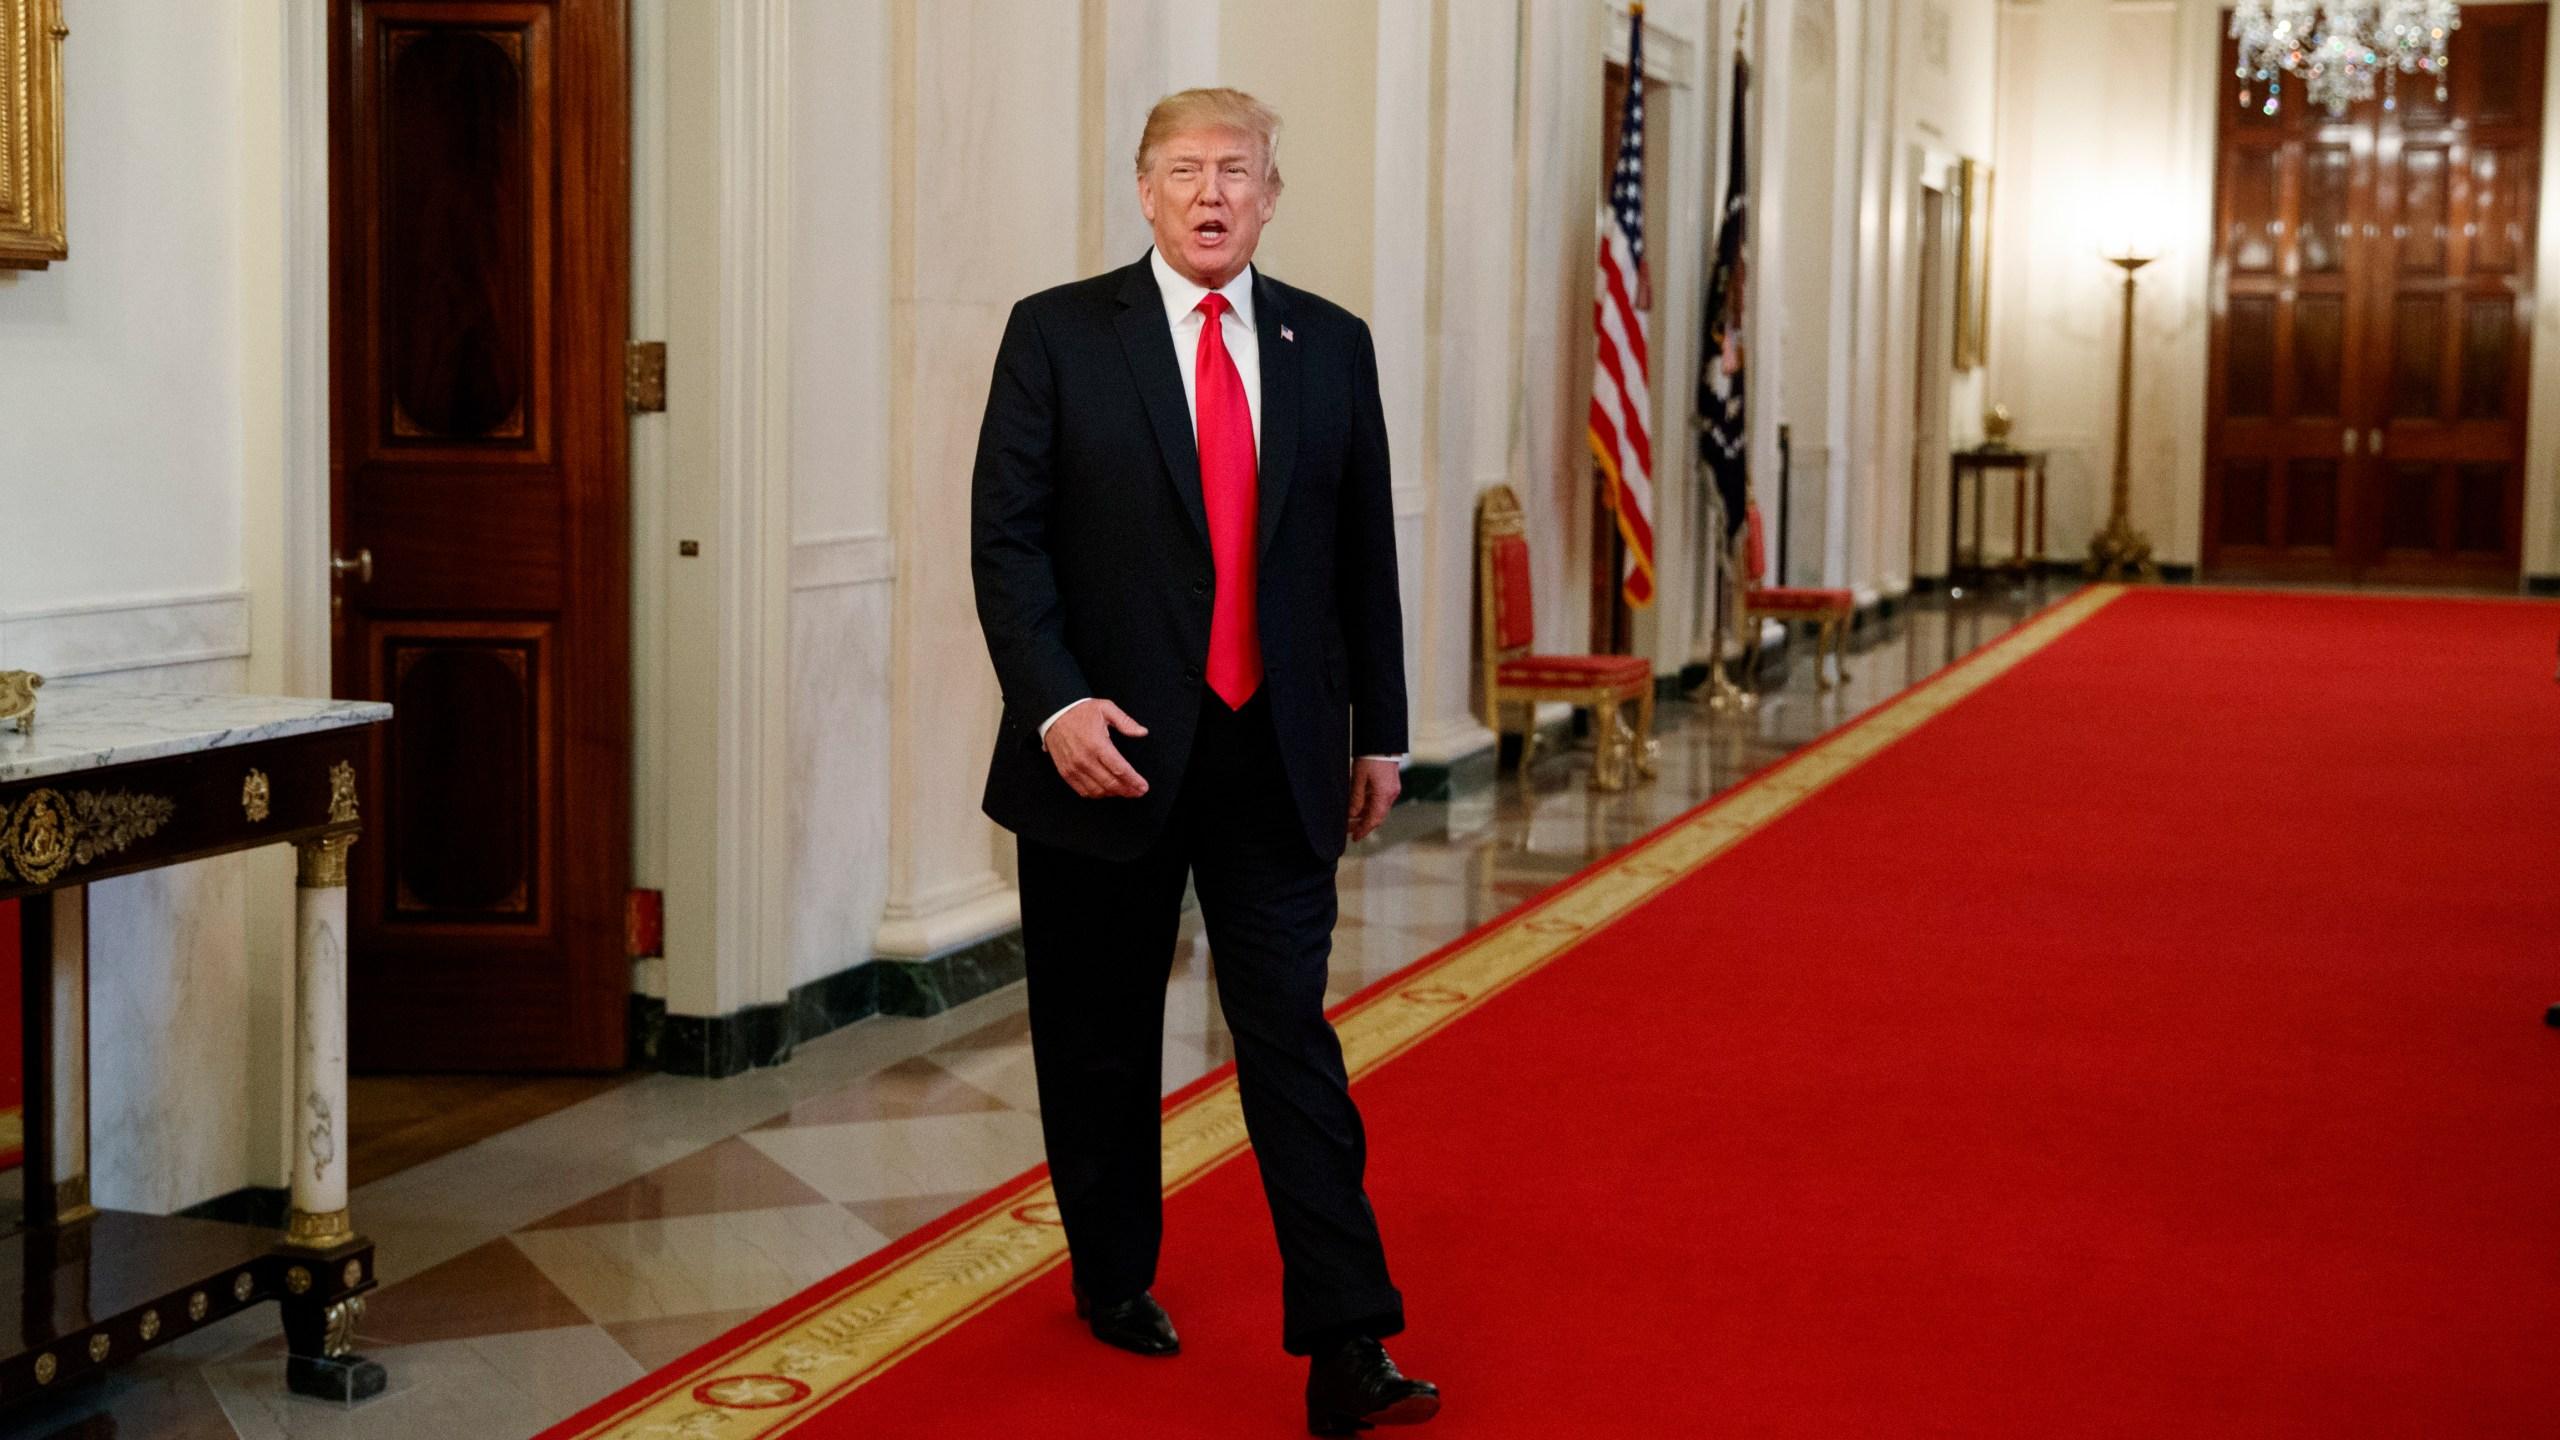 Trump_Opioids_32933-159532.jpg41853499